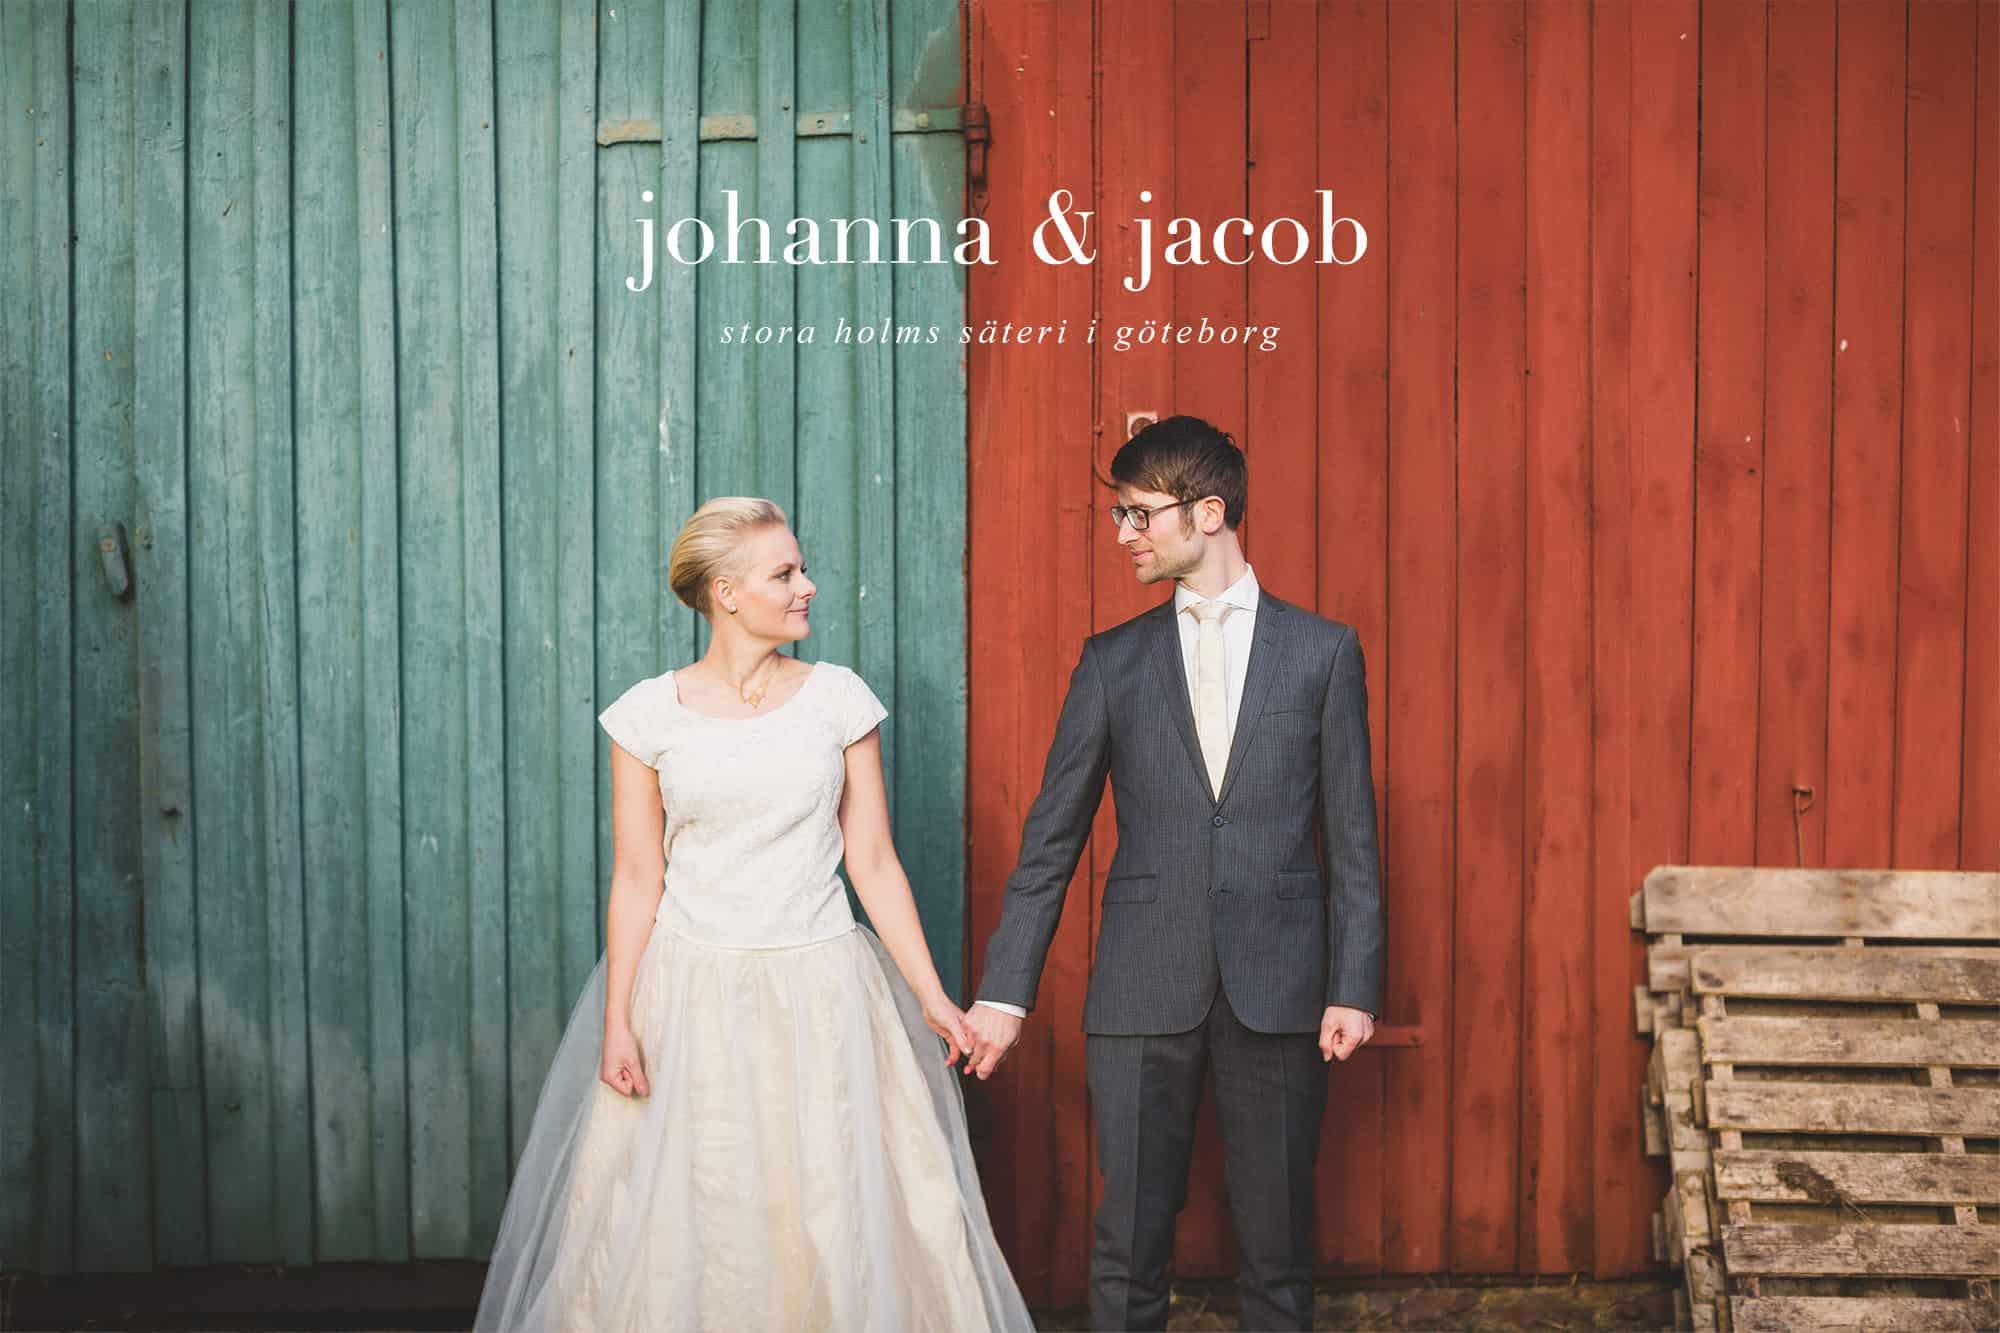 Johanna-&-Jacobs-höstbröllop-på-Stora-Holms-Säteri-i-göteborg